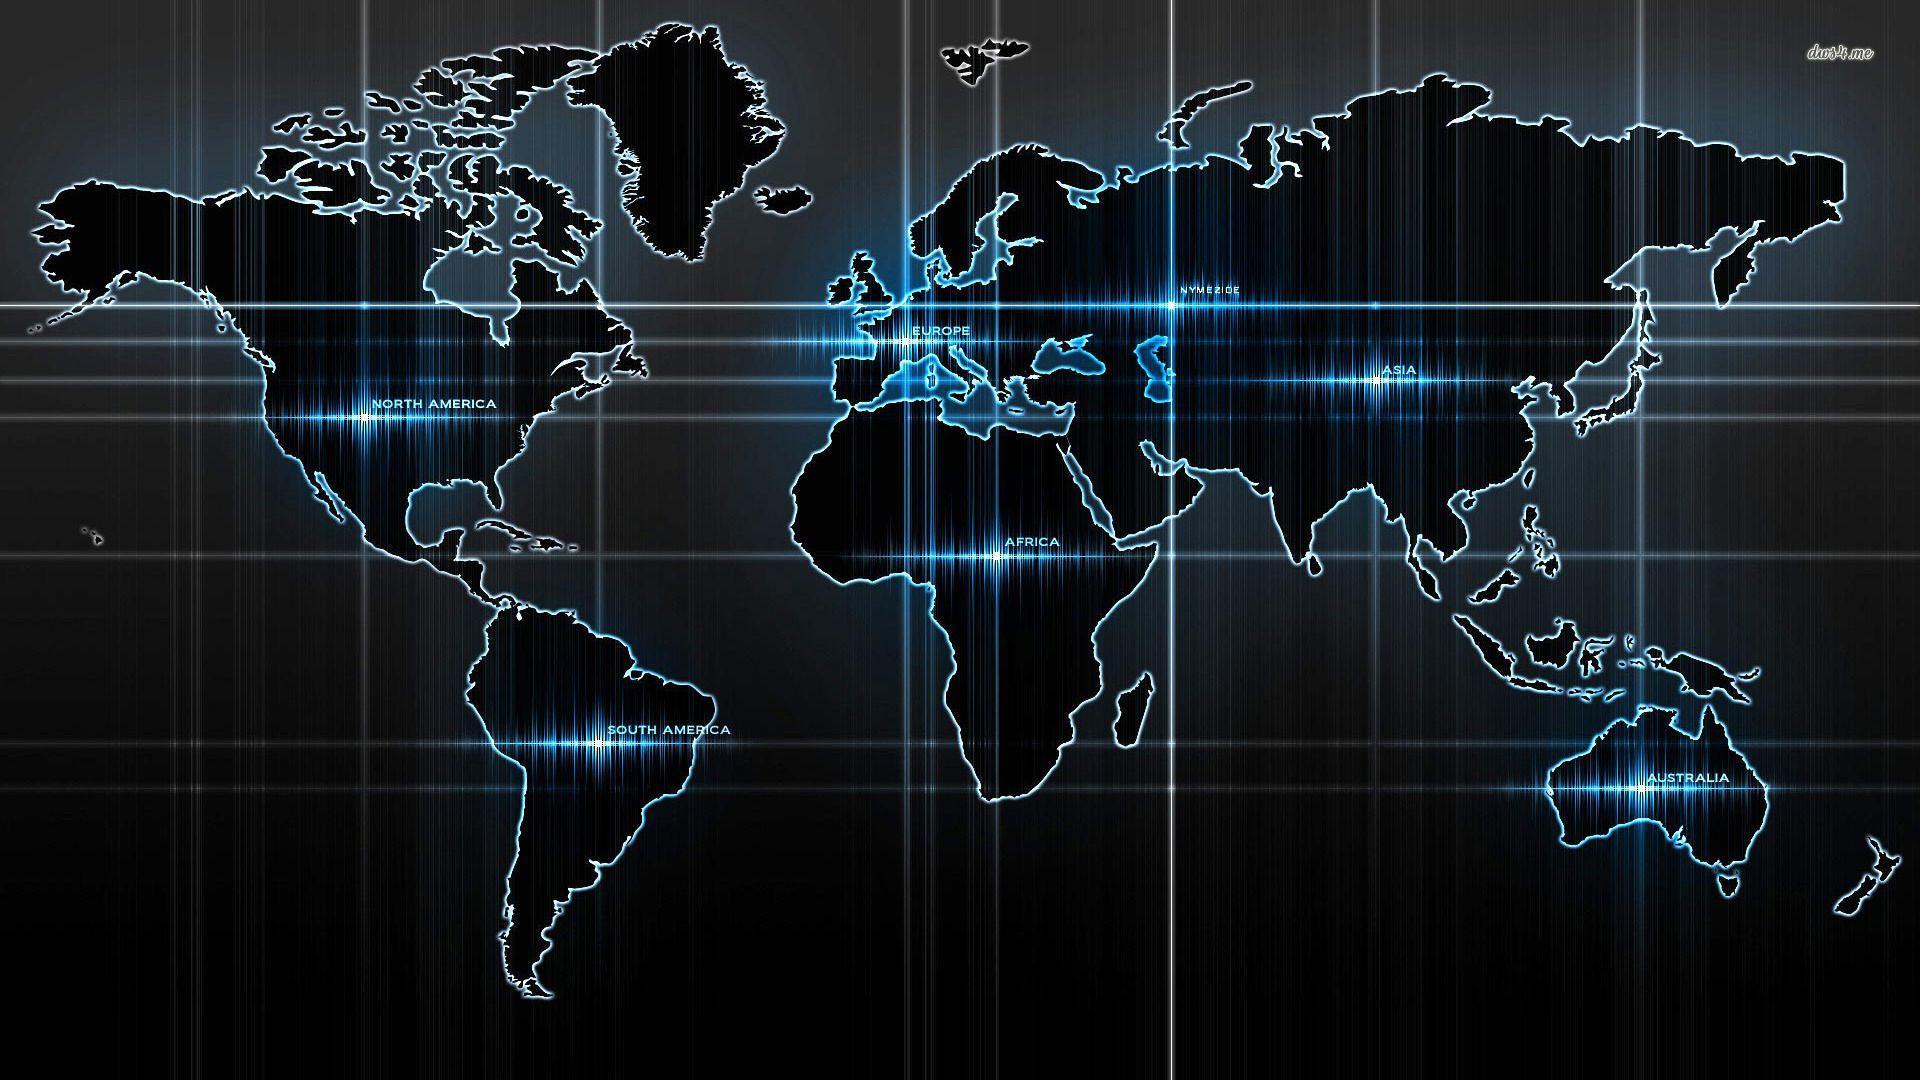 Digital World Wallpapers Top Free Digital World